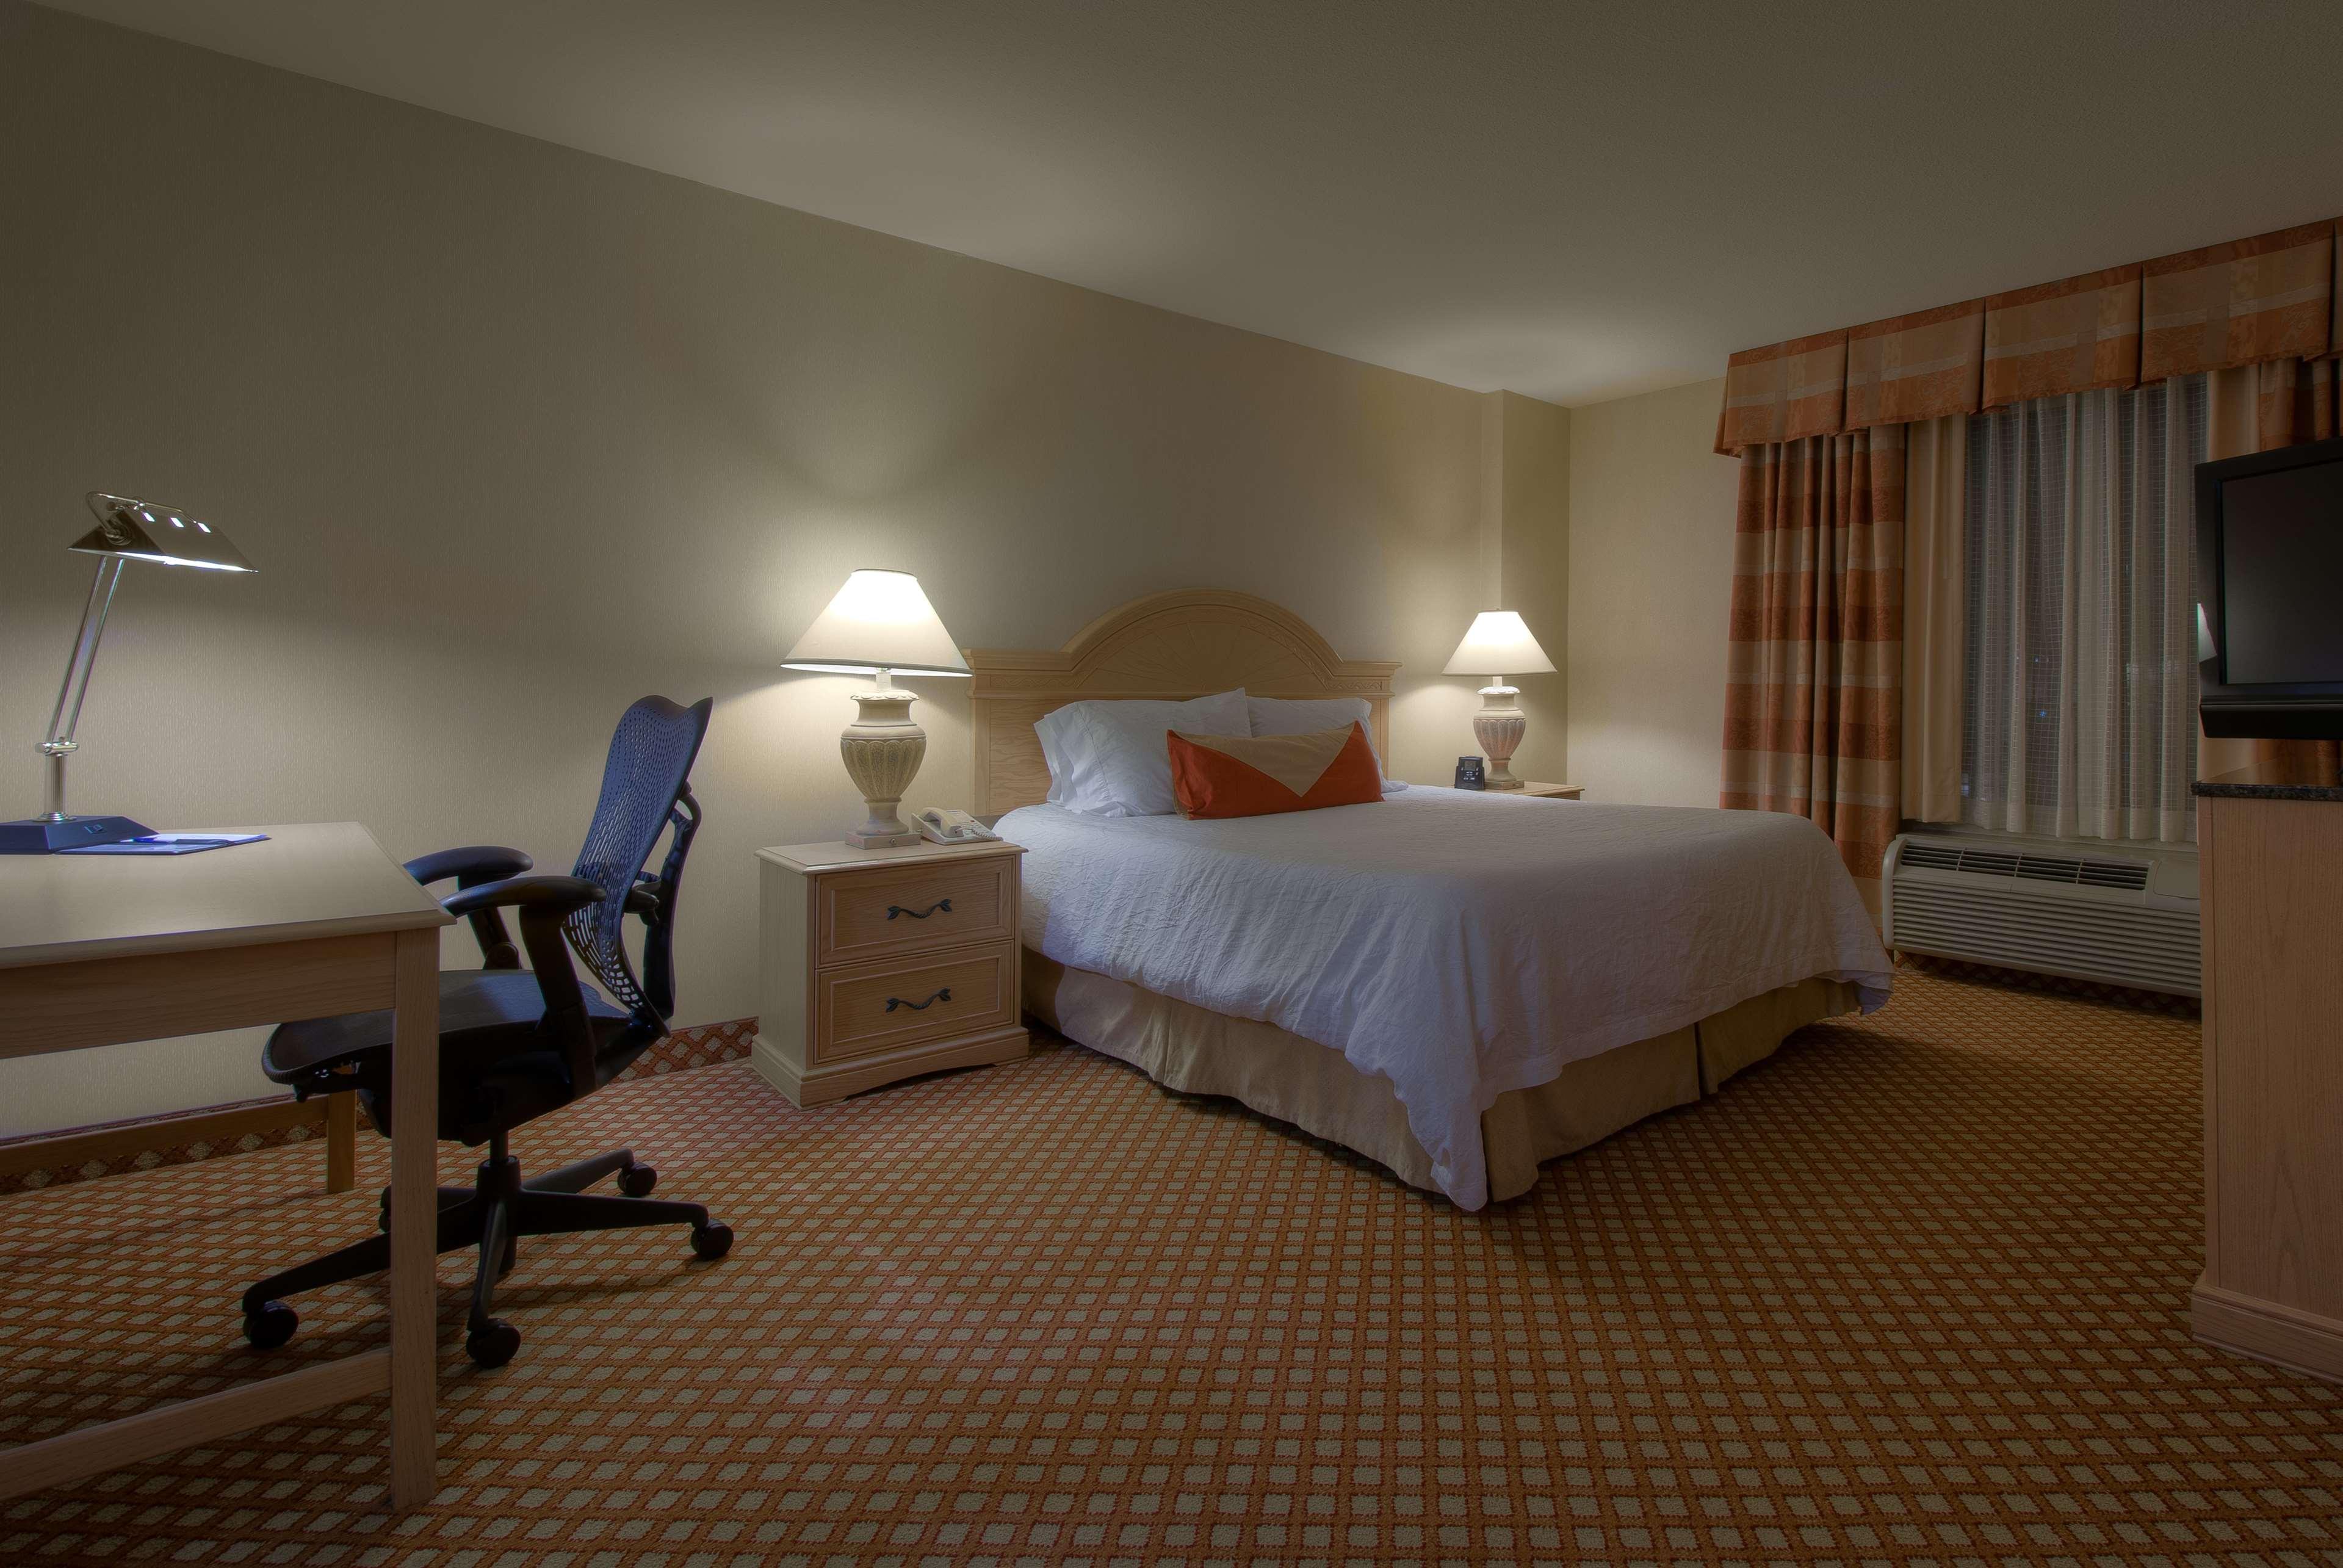 Hilton Garden Inn Mountain View image 6